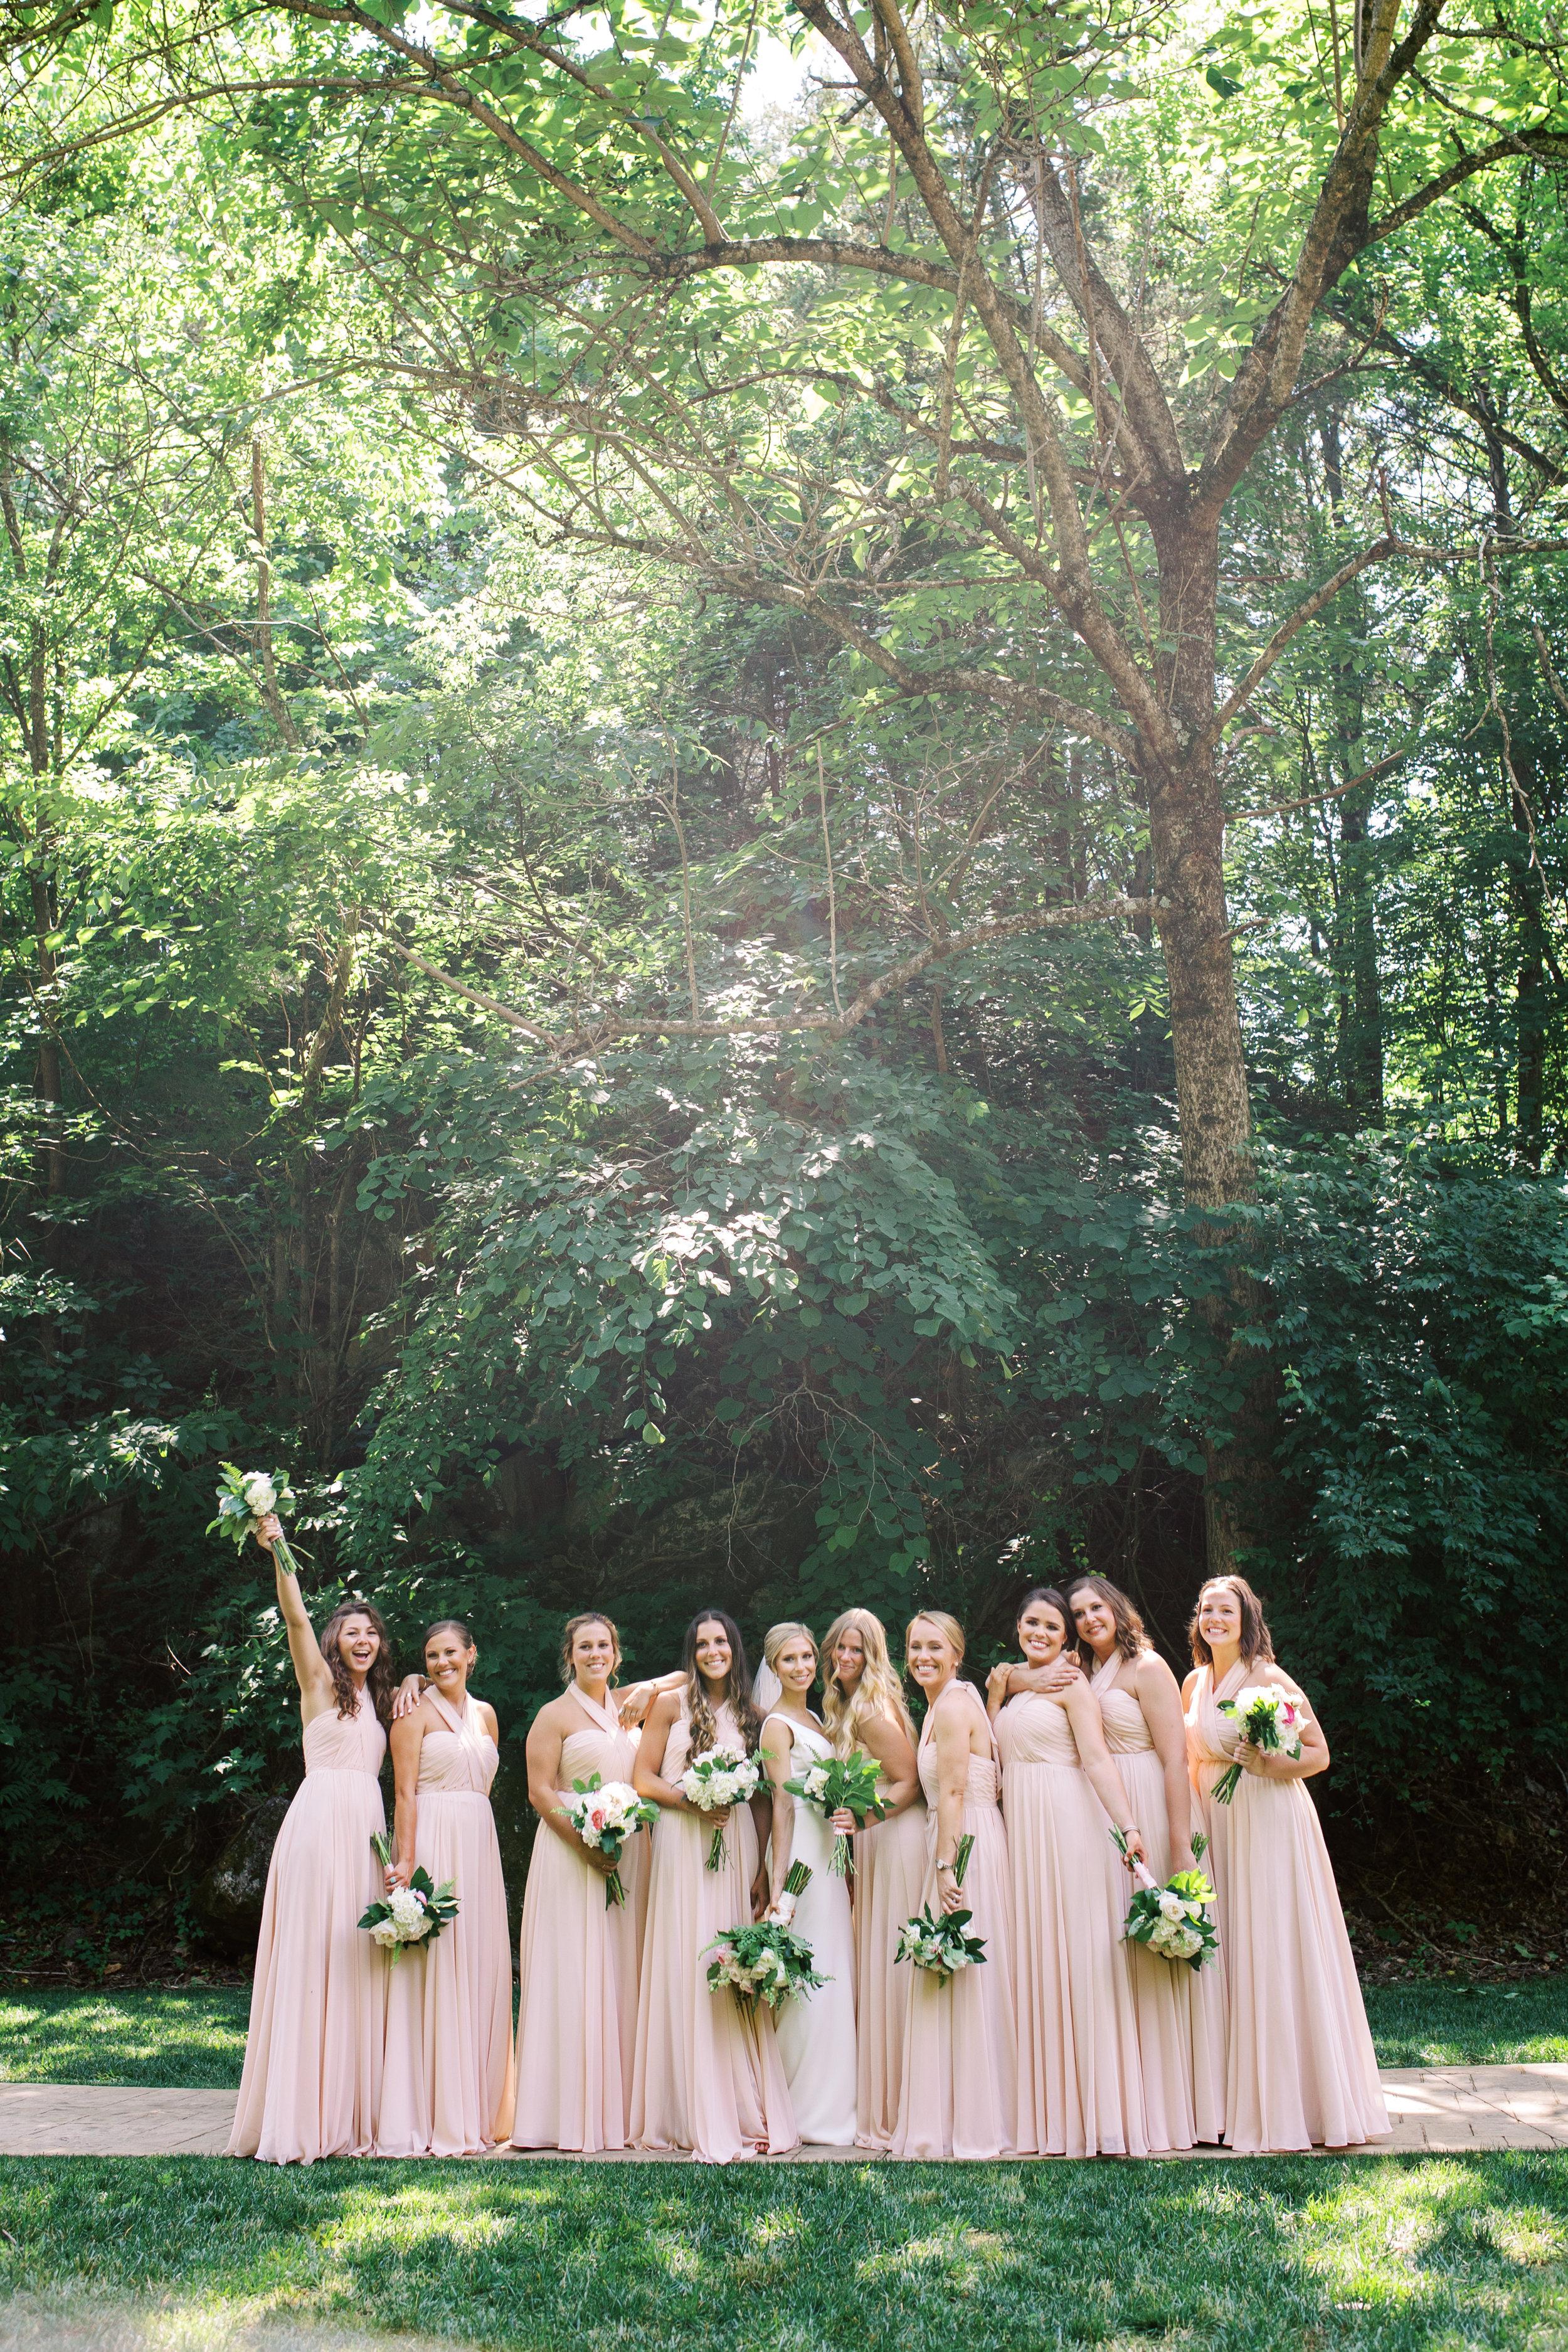 Olivia_Patrick_Wedding_Quarry_Venue_Abigail_Malone_Photography_Knoxville-331.jpg